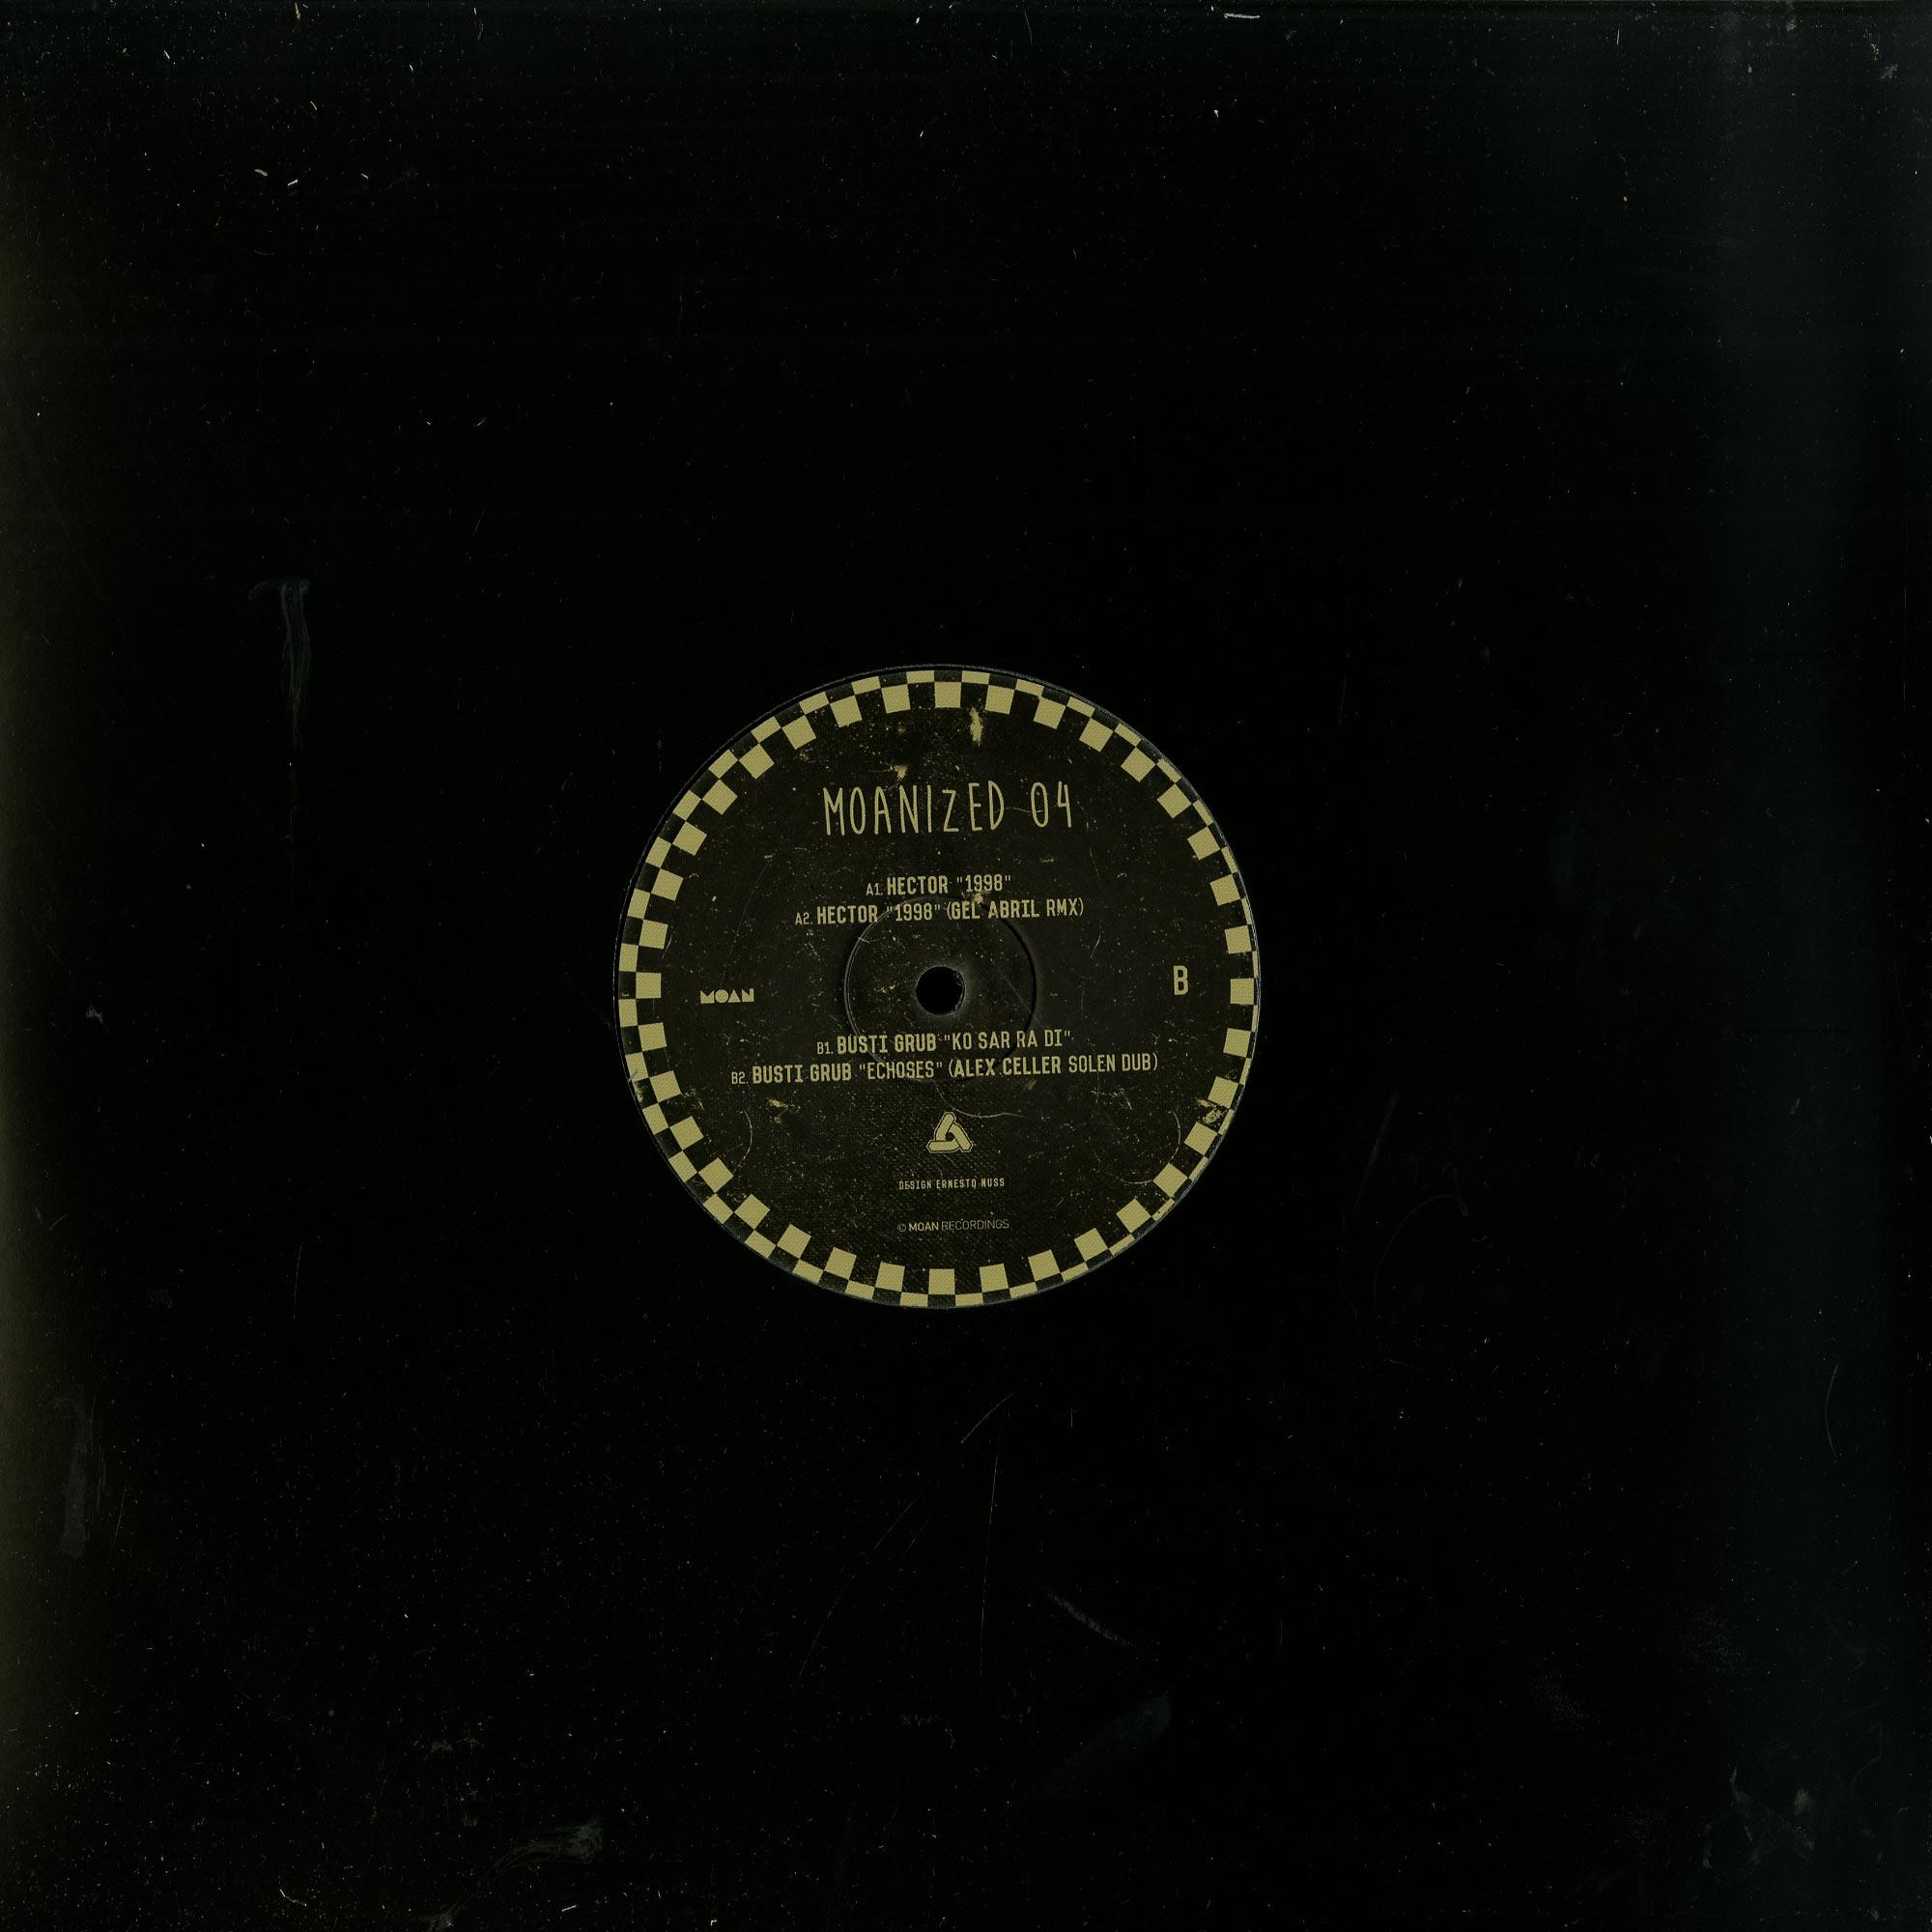 Hector / Basti Grub - MOANIZED 04